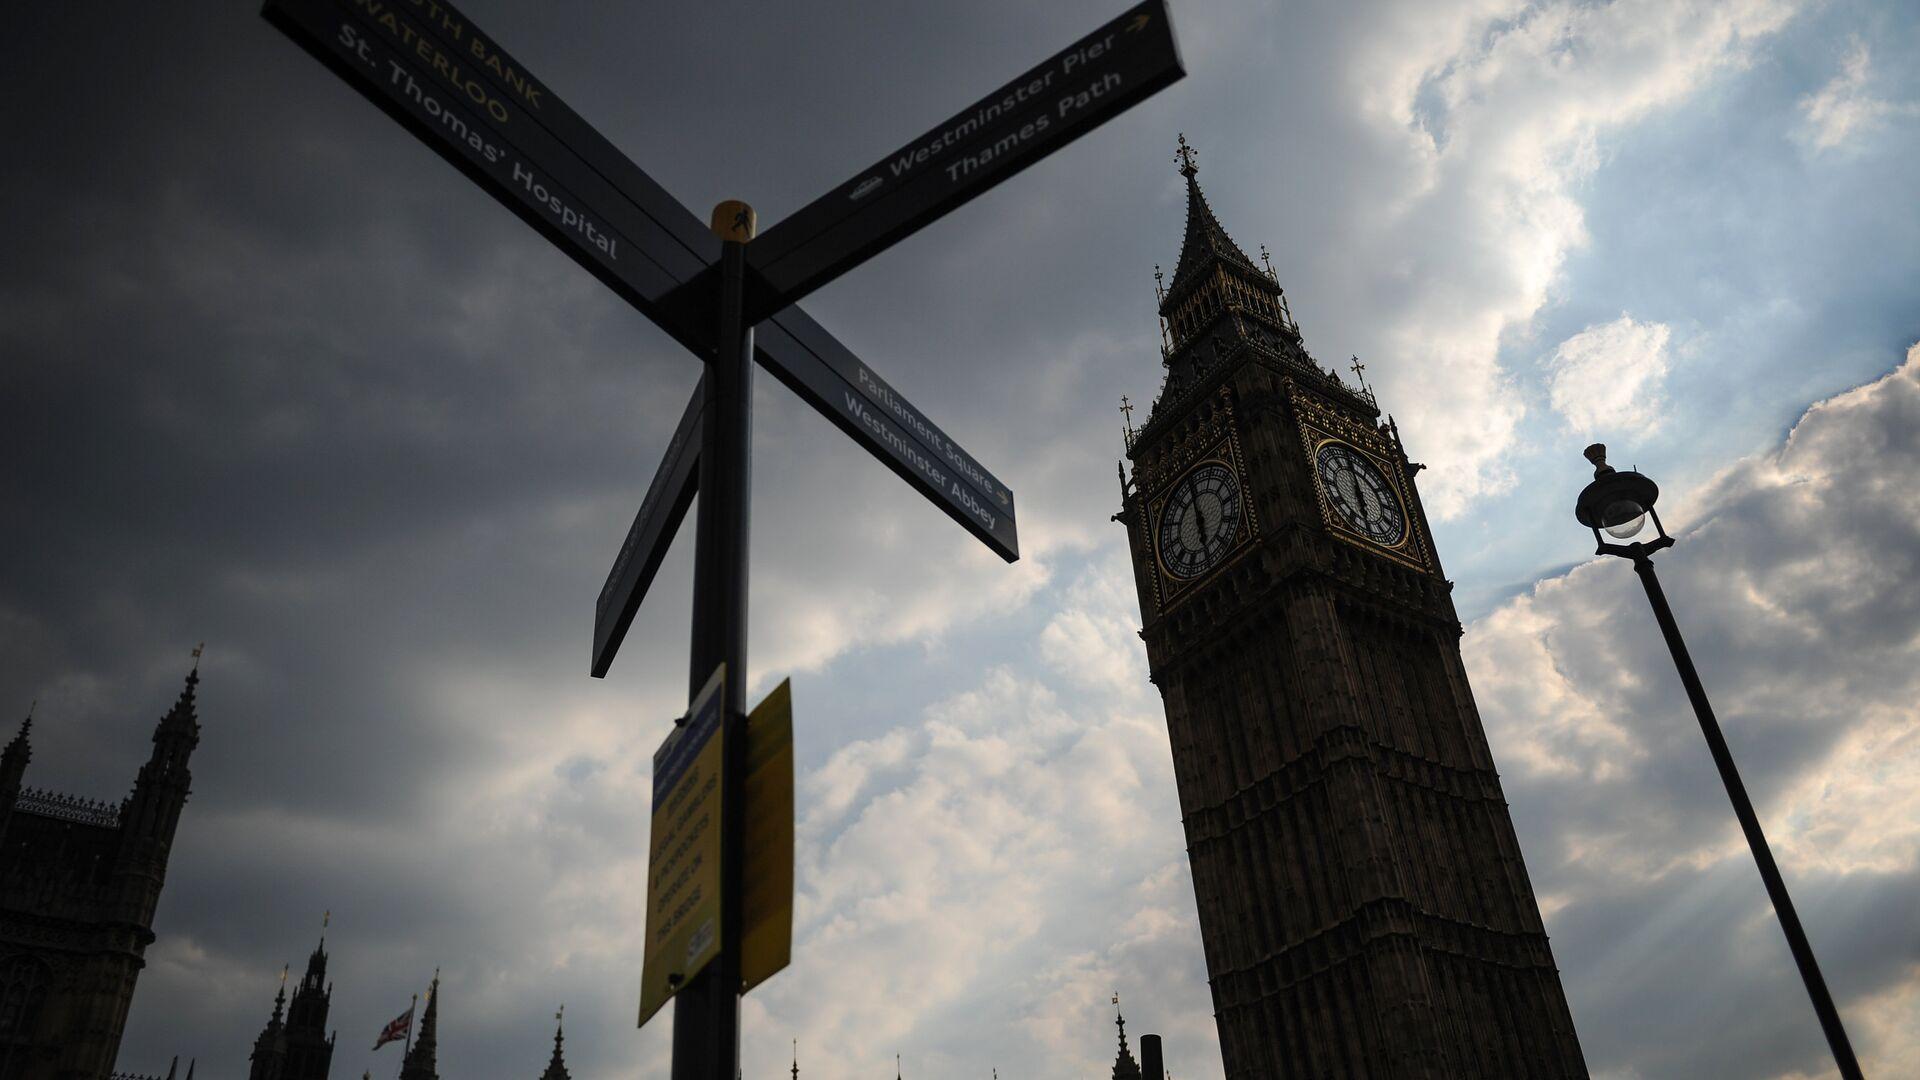 Big Big clock tower of Westminster Palace. - Sputnik International, 1920, 27.09.2021